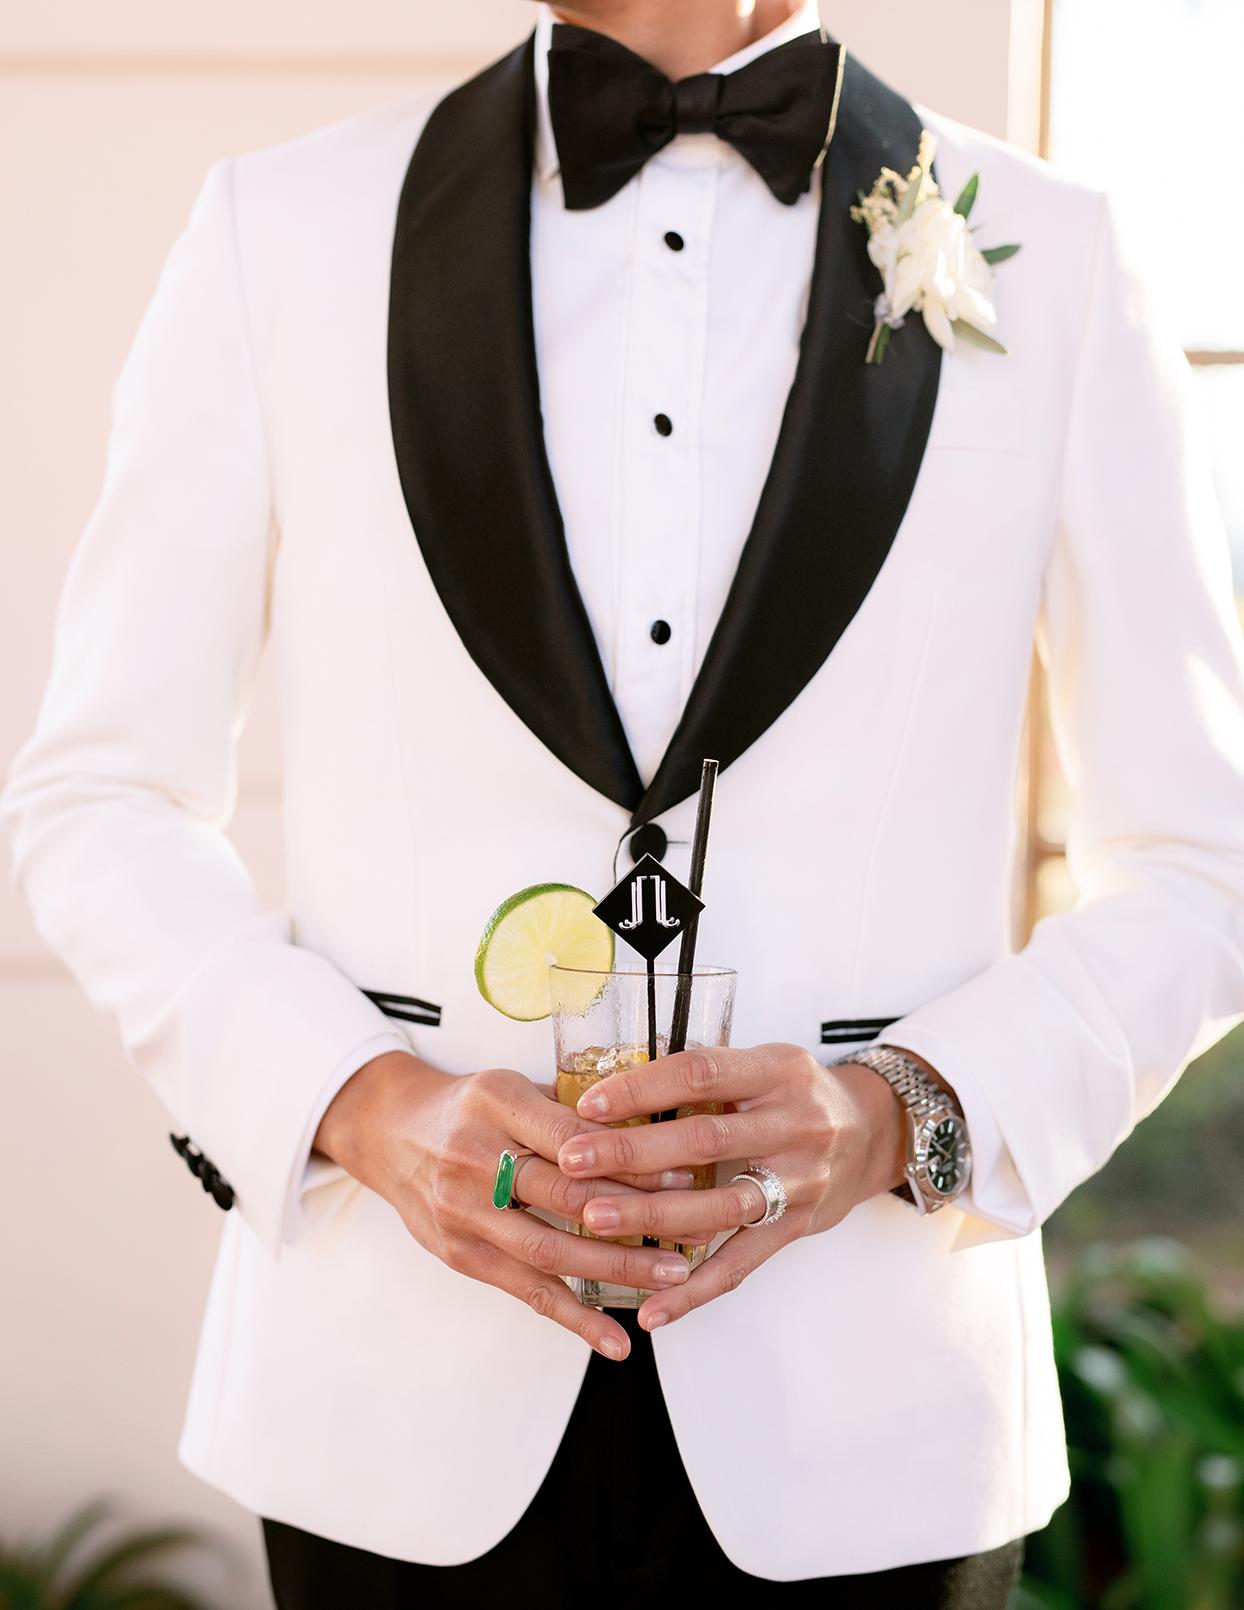 jason justin holding wedding drinks